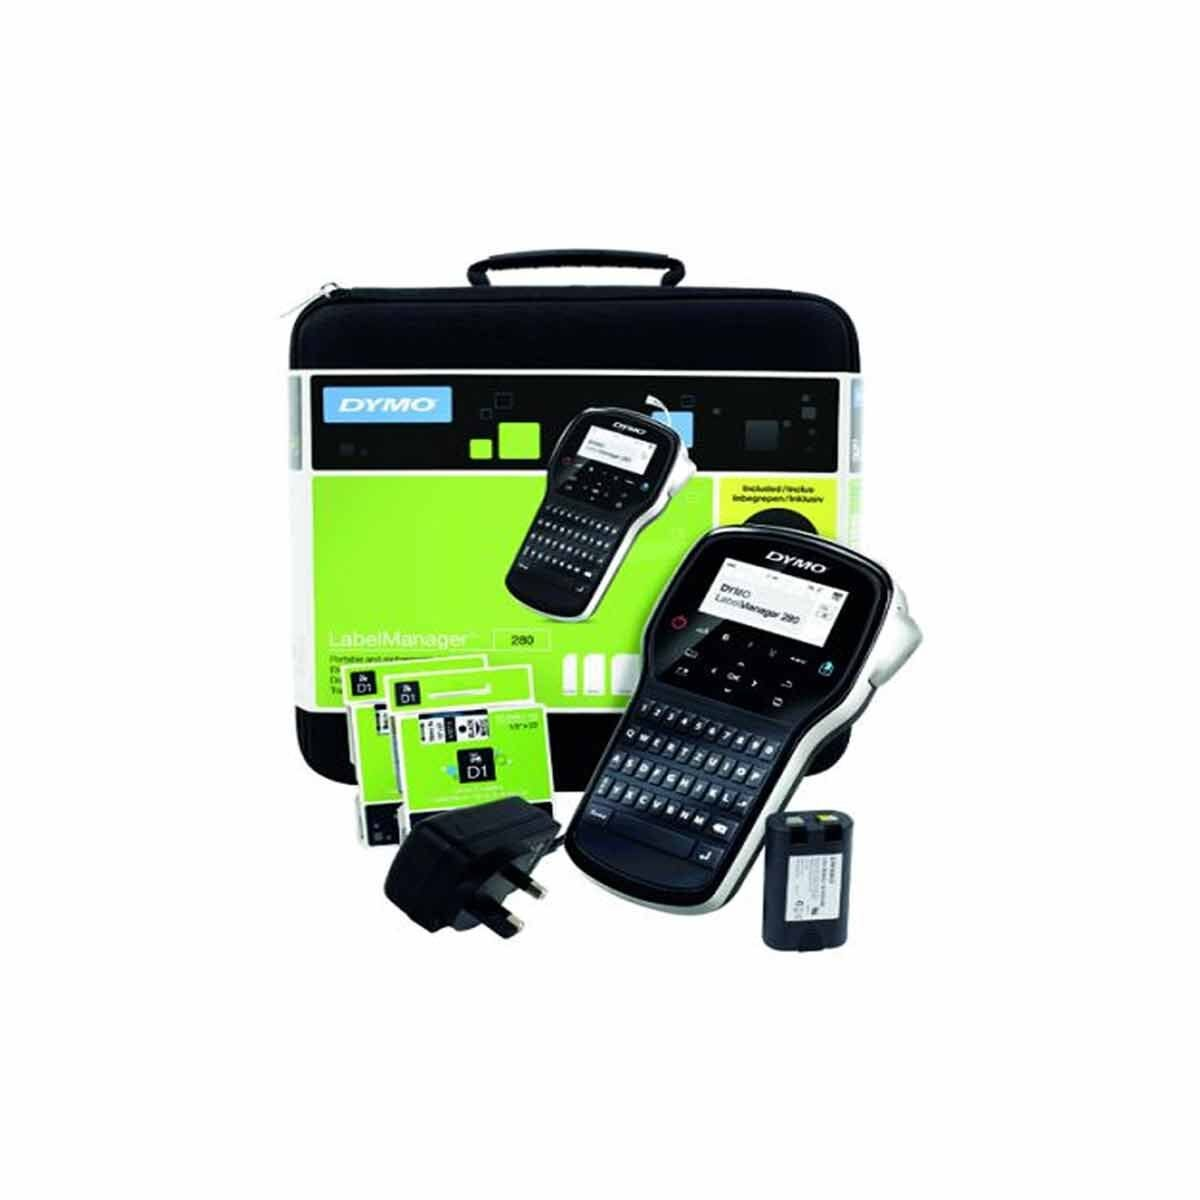 DYMO Label Manager 280 Kit Case